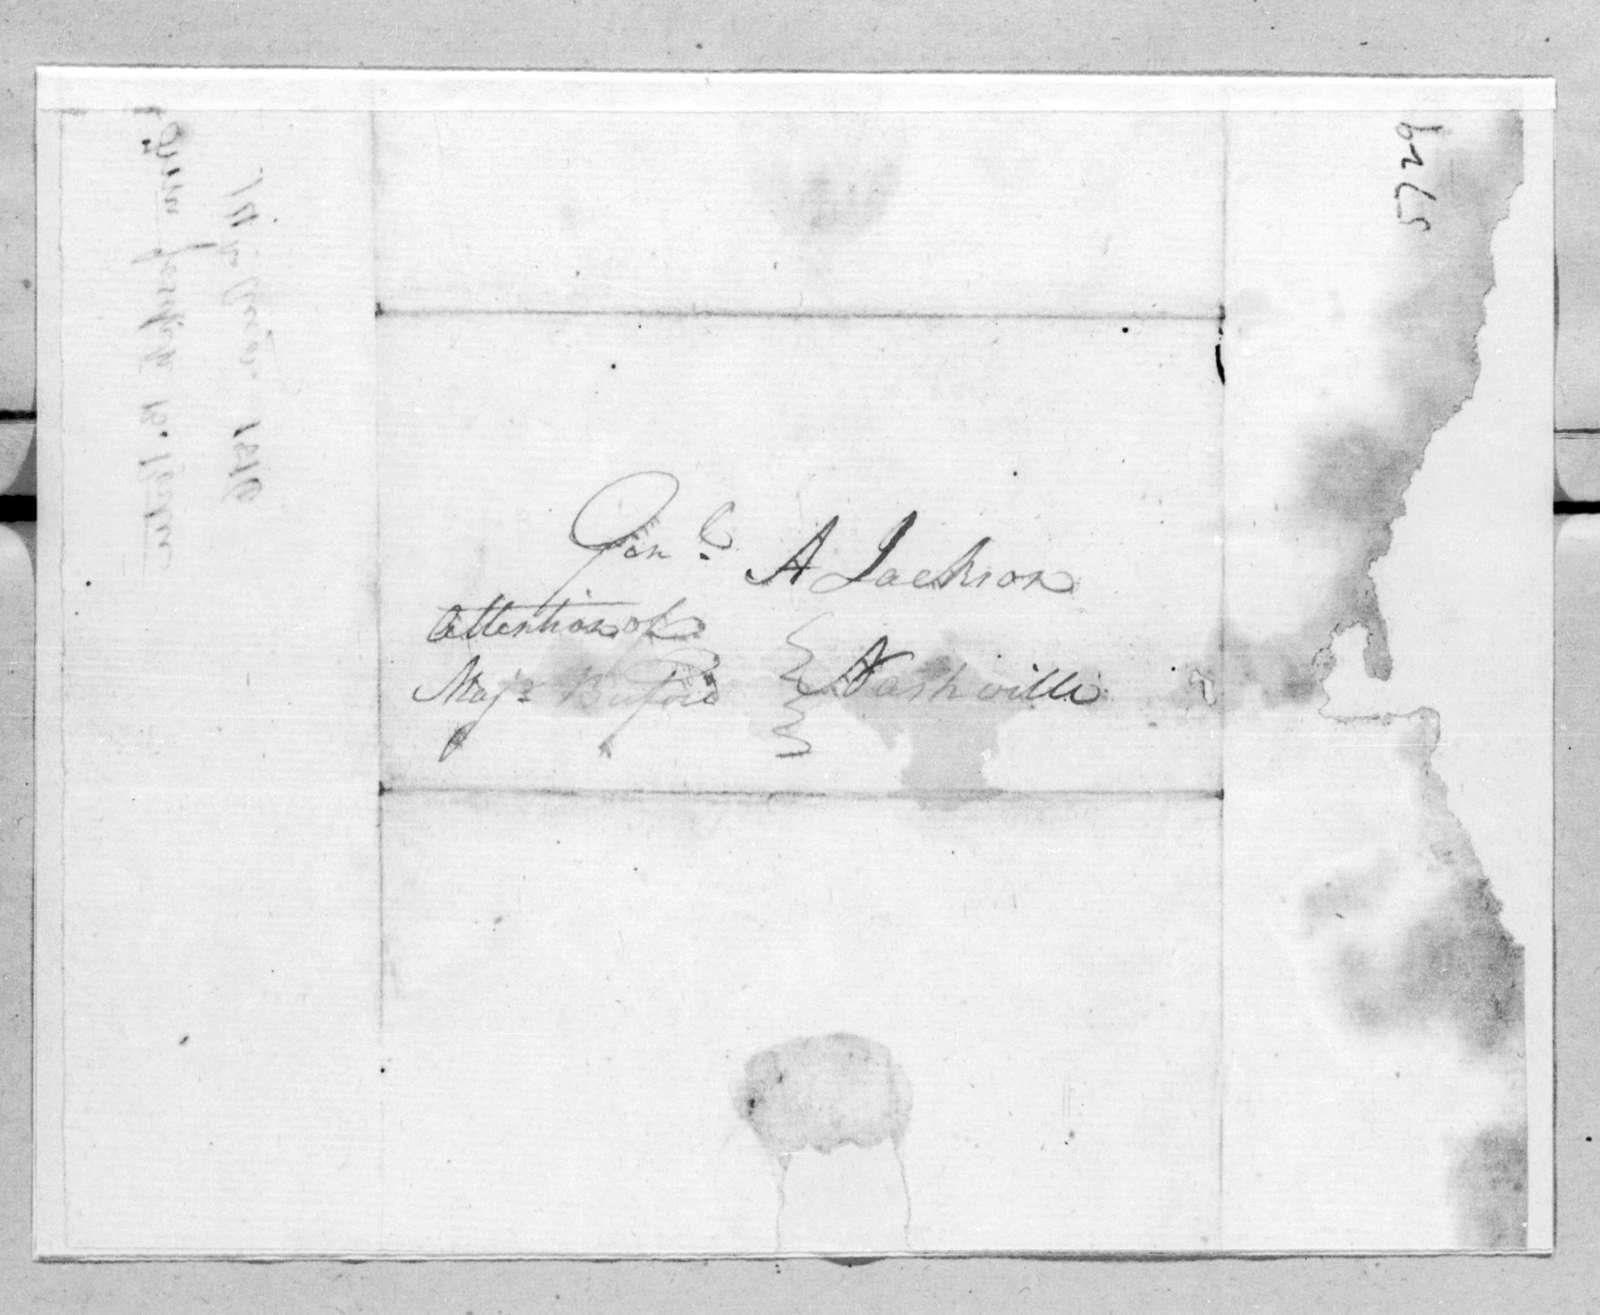 Joseph B. Porter to Andrew Jackson, August 14, 1816